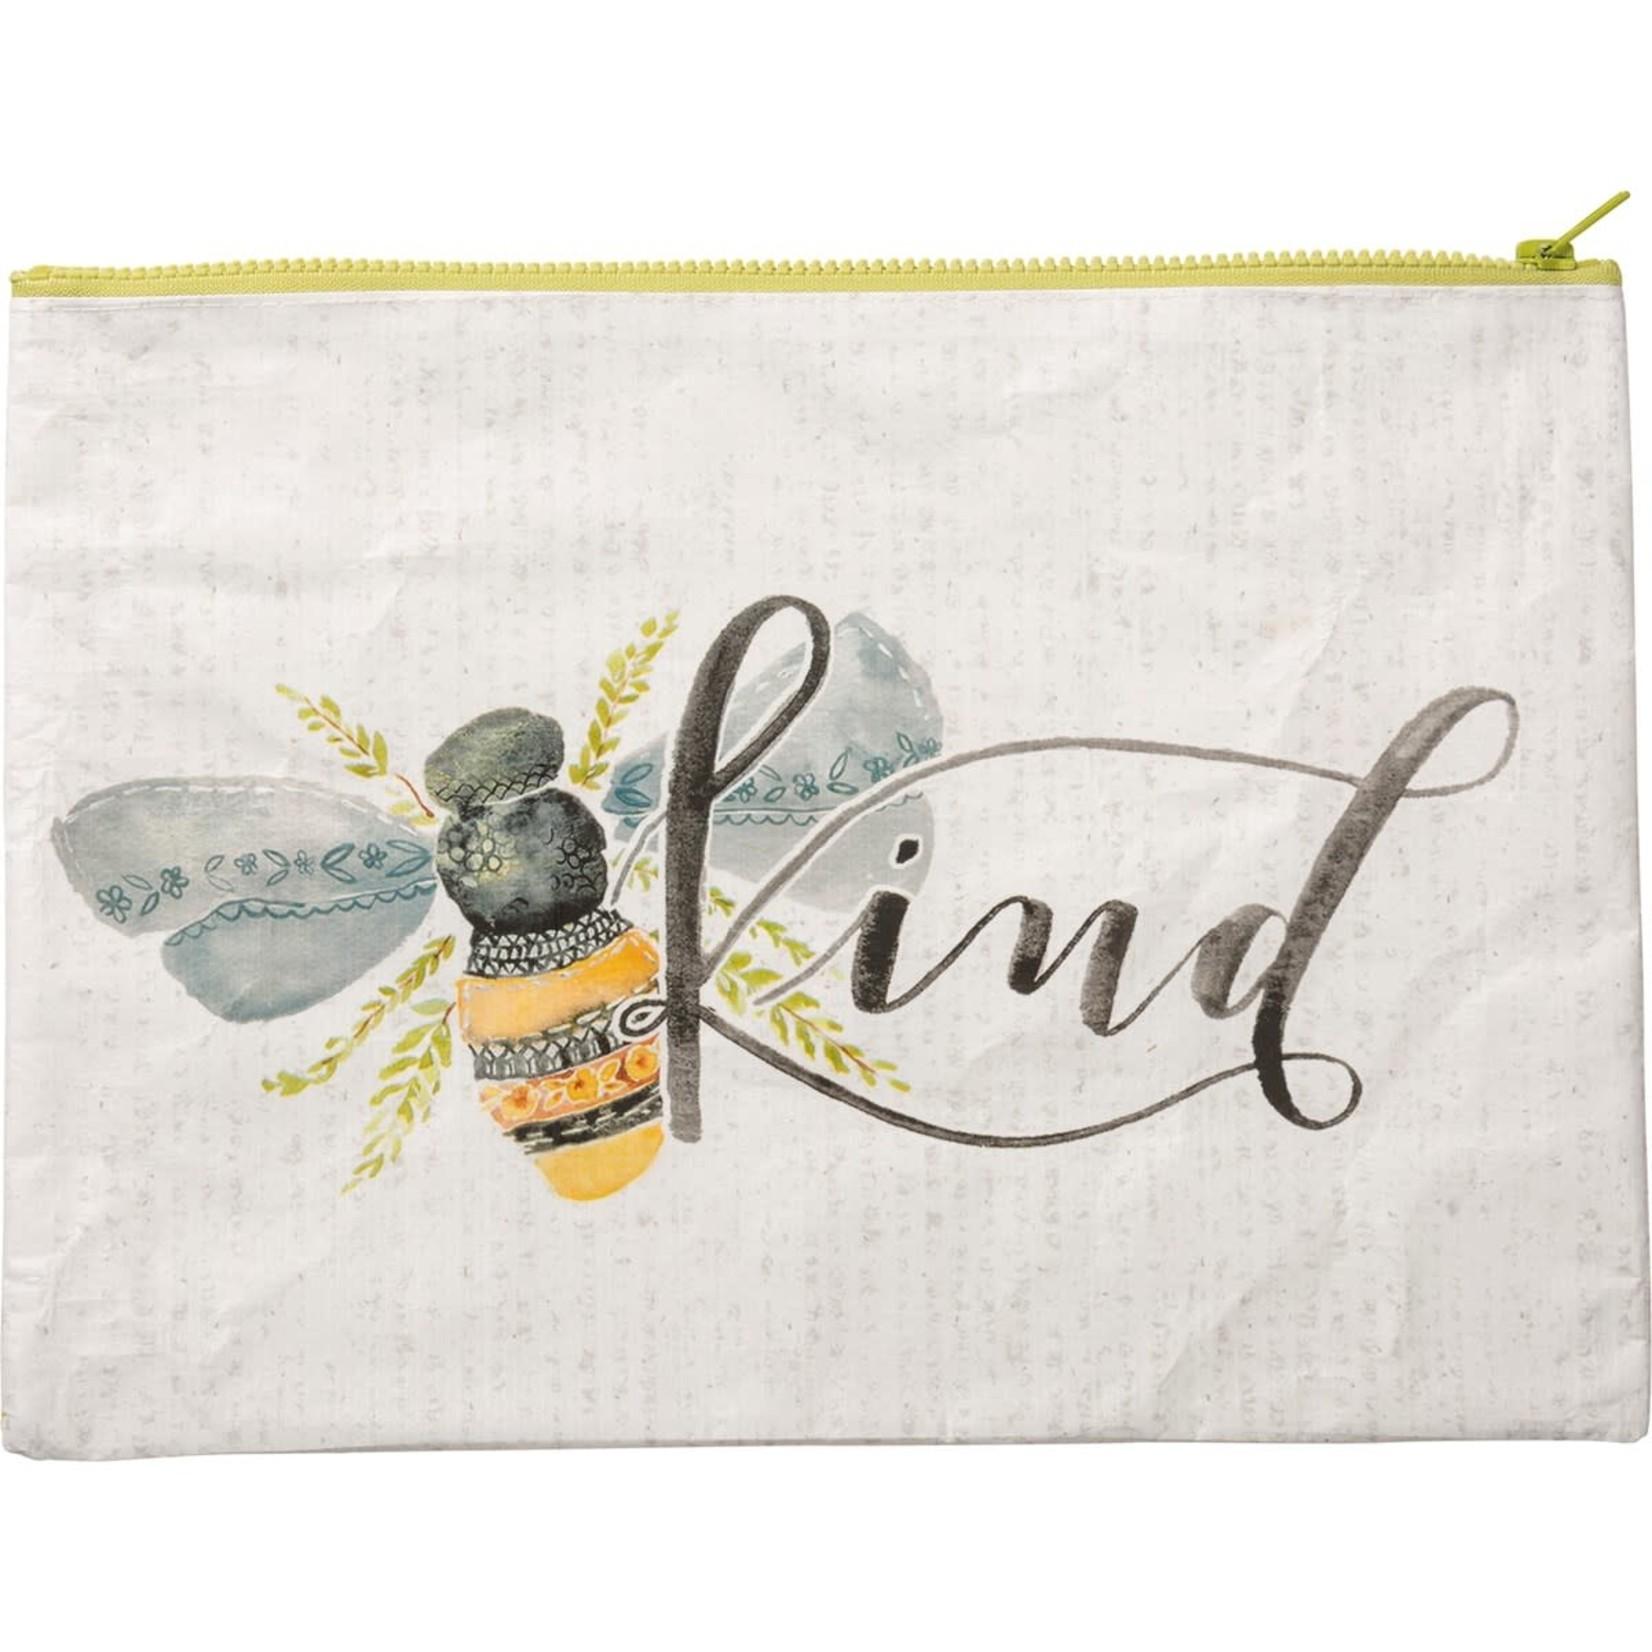 Primitives by Kathy Travel: Bee Kind Zipper Folder